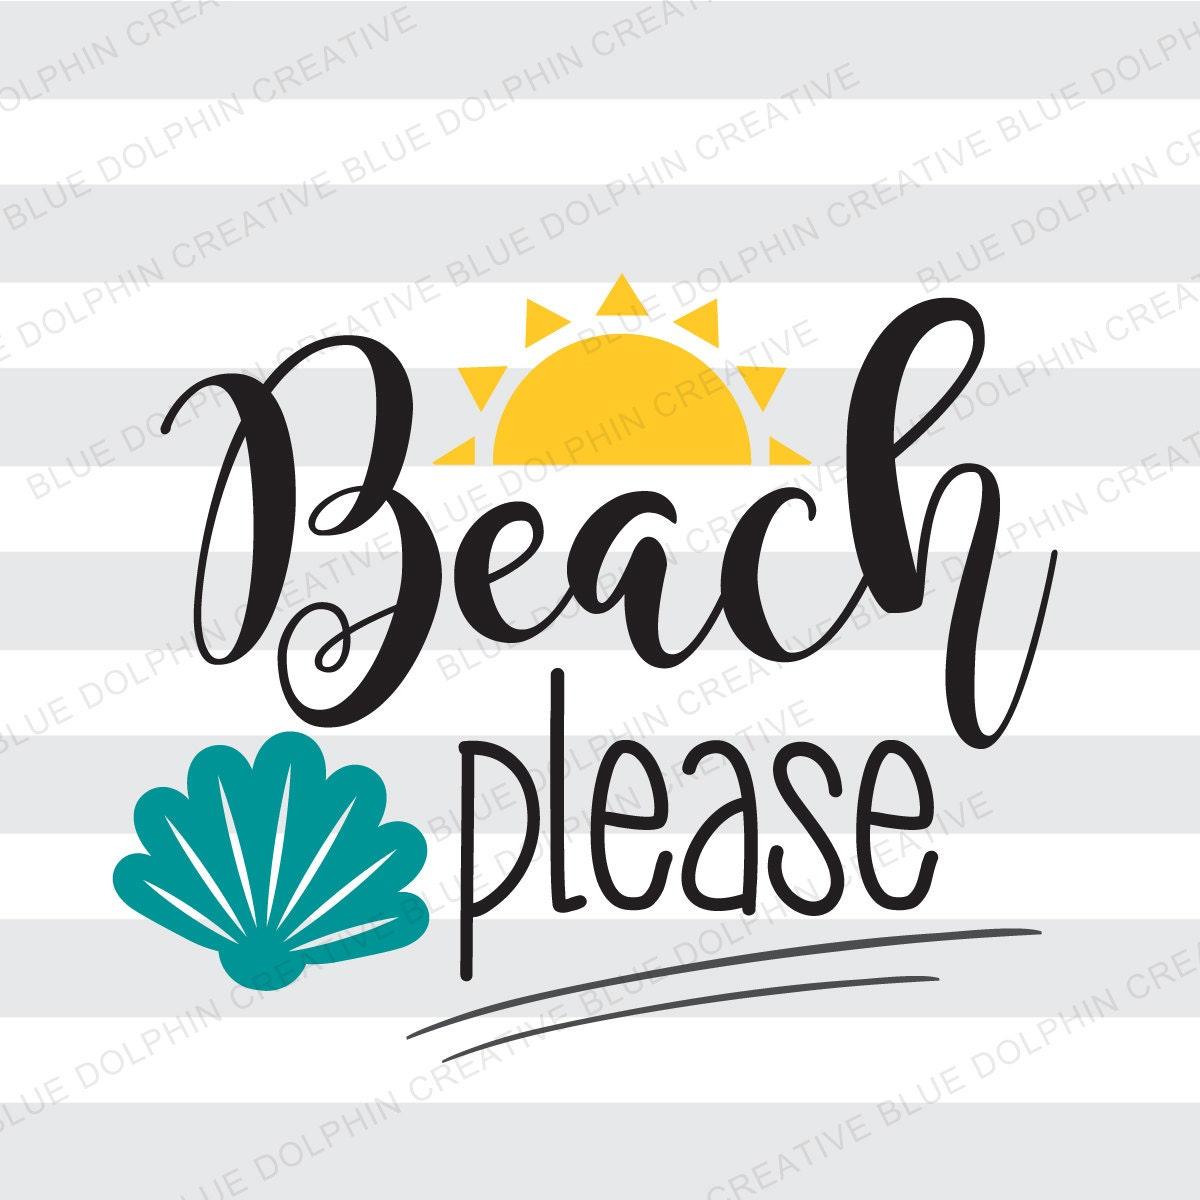 Beach Please Svg Png Pdf Cricut Silhouette Cutting Files